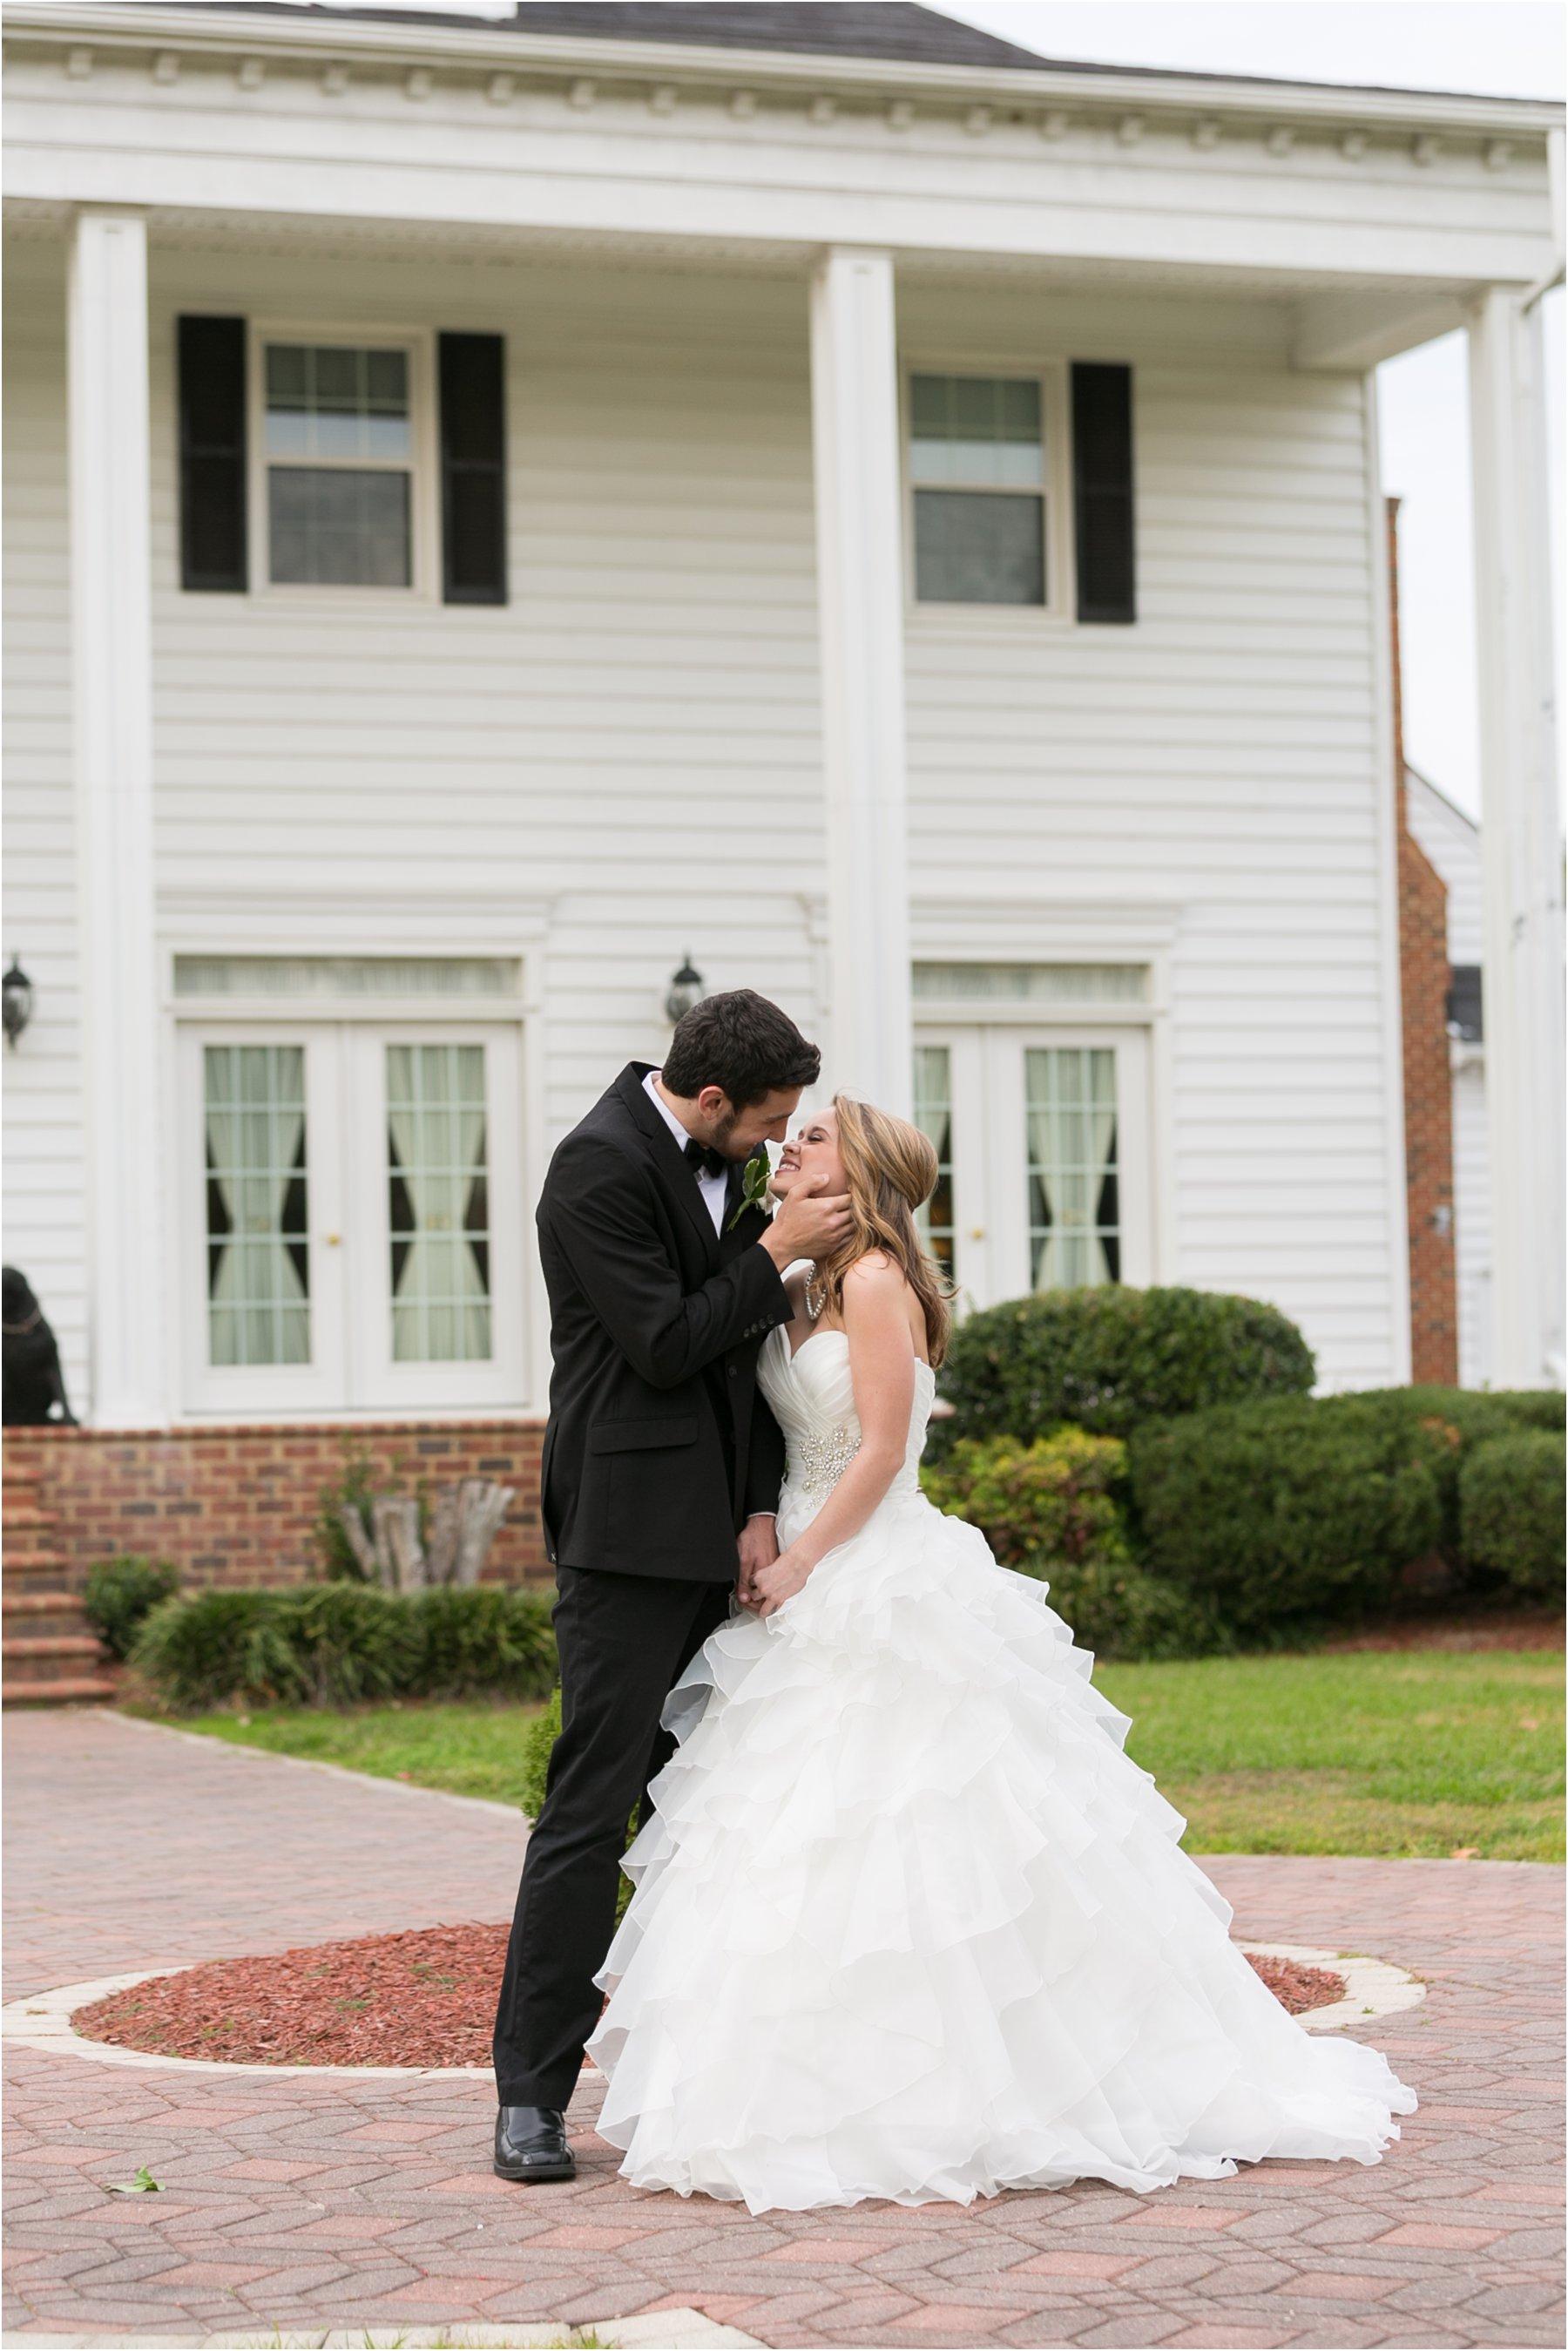 Holly_Ridge_Manor_Wedding_Photography_Jessica_Ryan_Photography_virginia_virginia_beach_0256